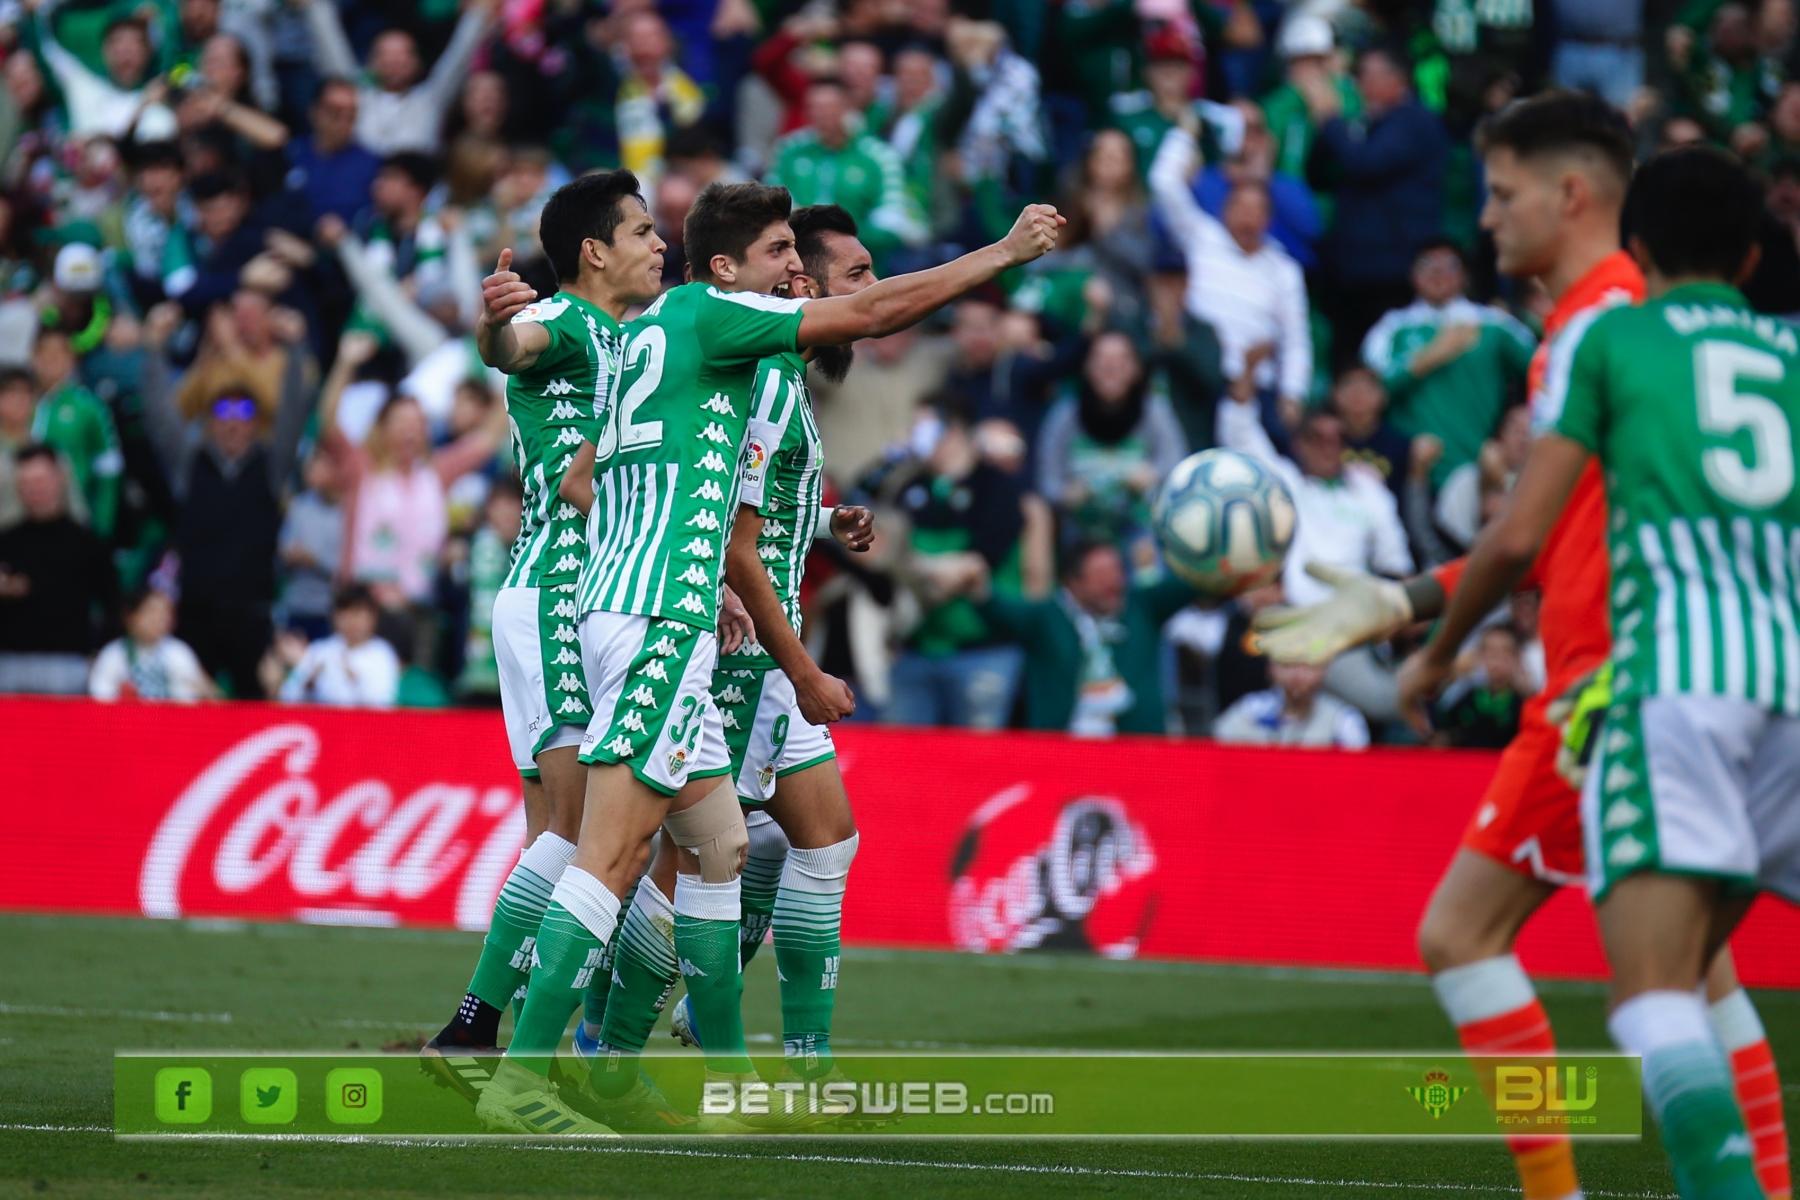 J20 Real Betis - Real Sociedad 25